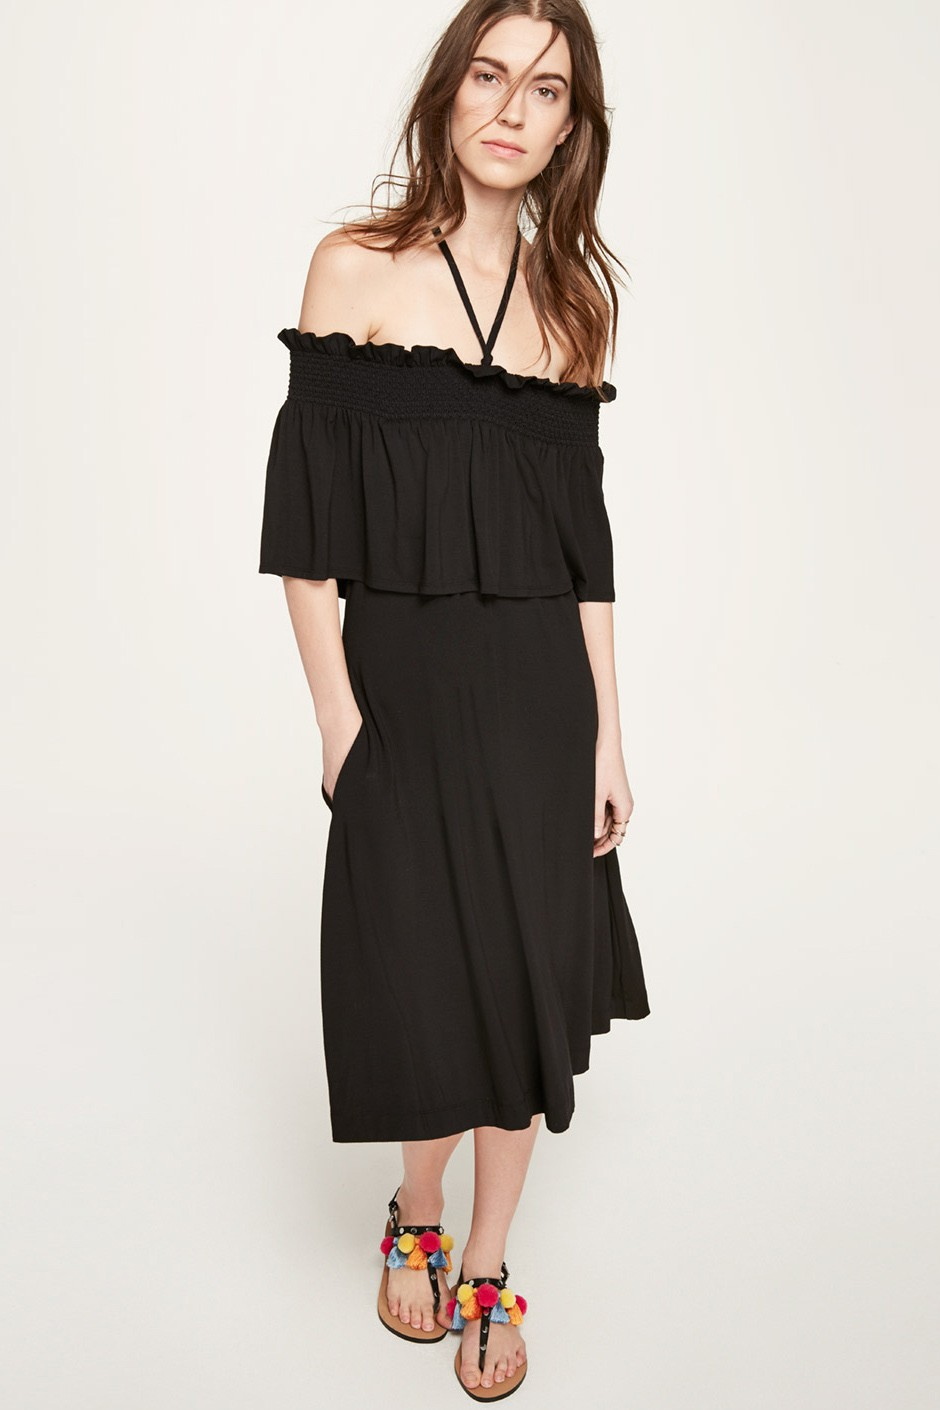 Rebecca Minkoff Ghiradelle Dress In Black